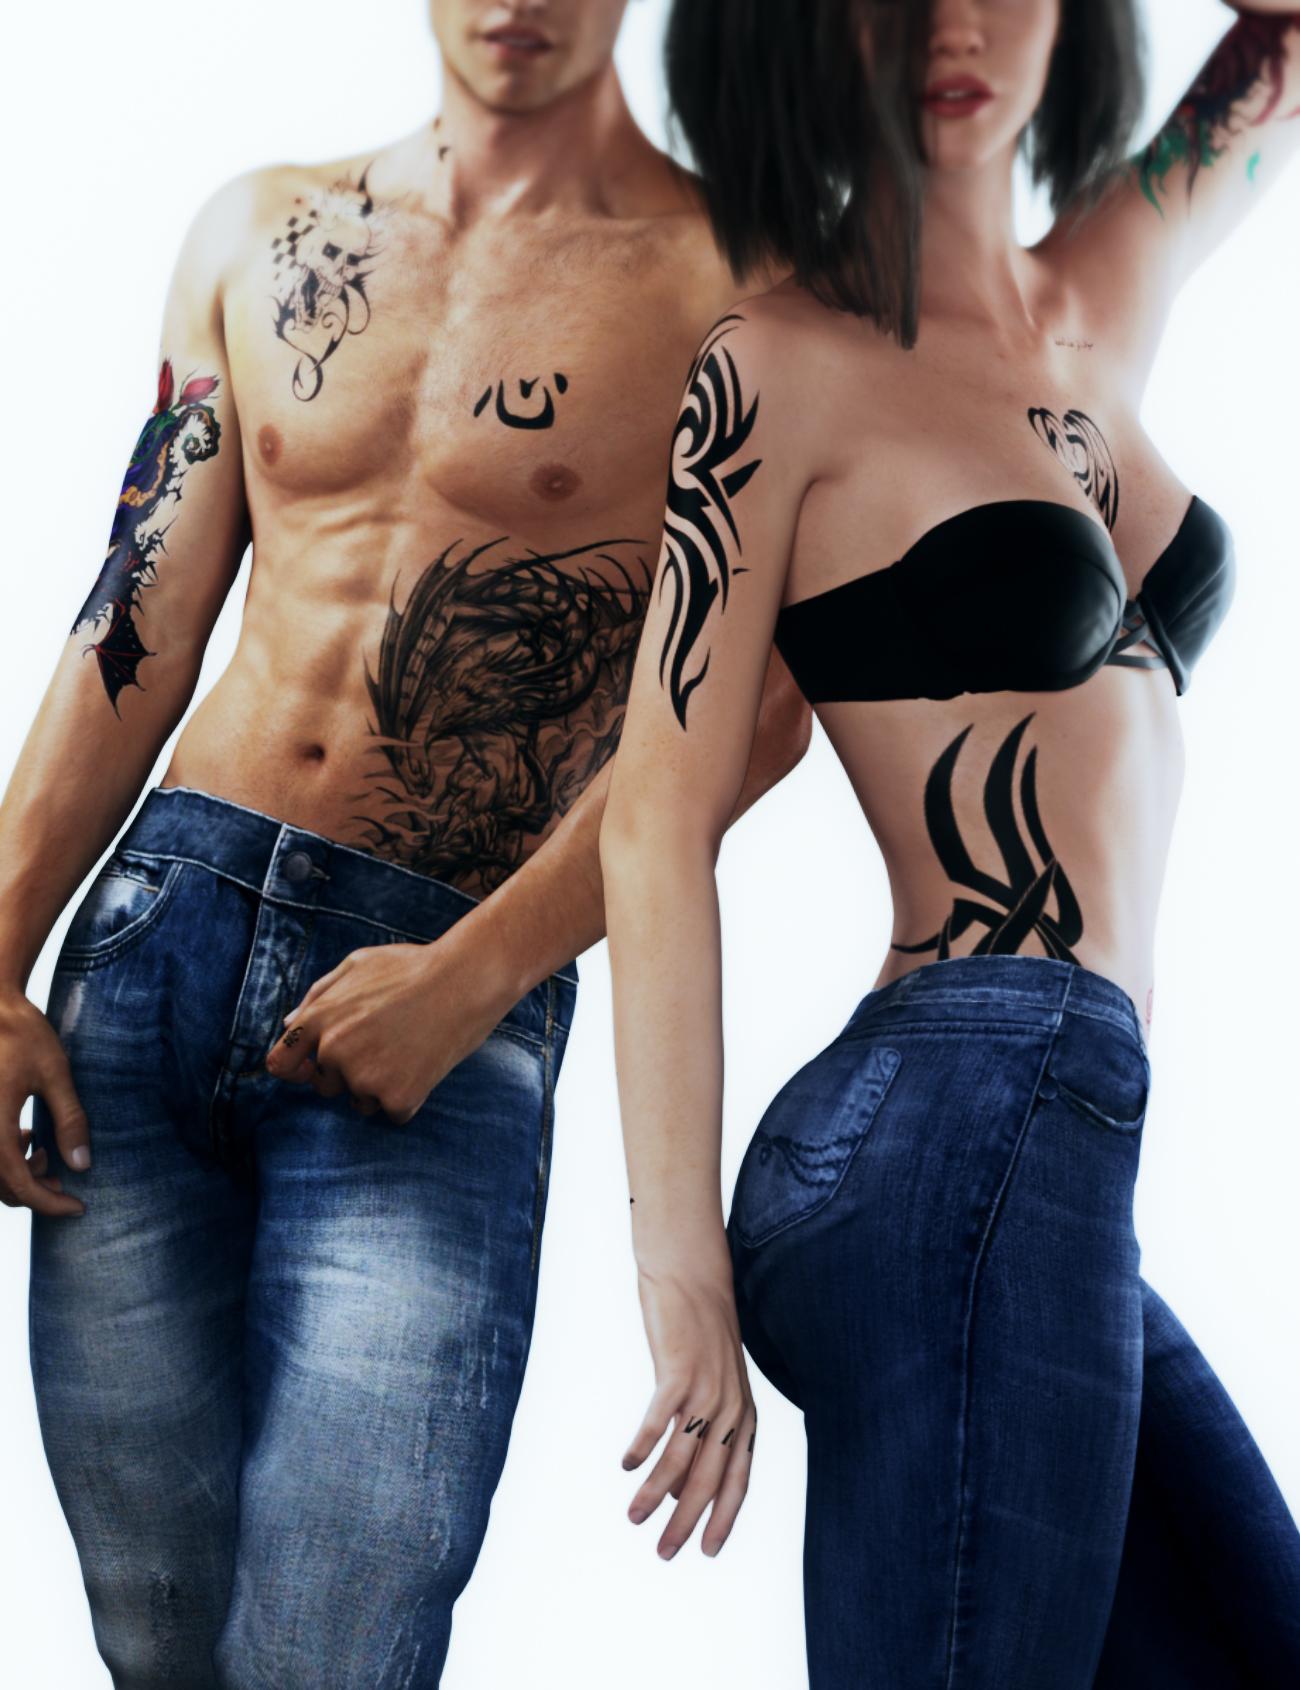 Tattoo Bundle by: Neikdian, 3D Models by Daz 3D